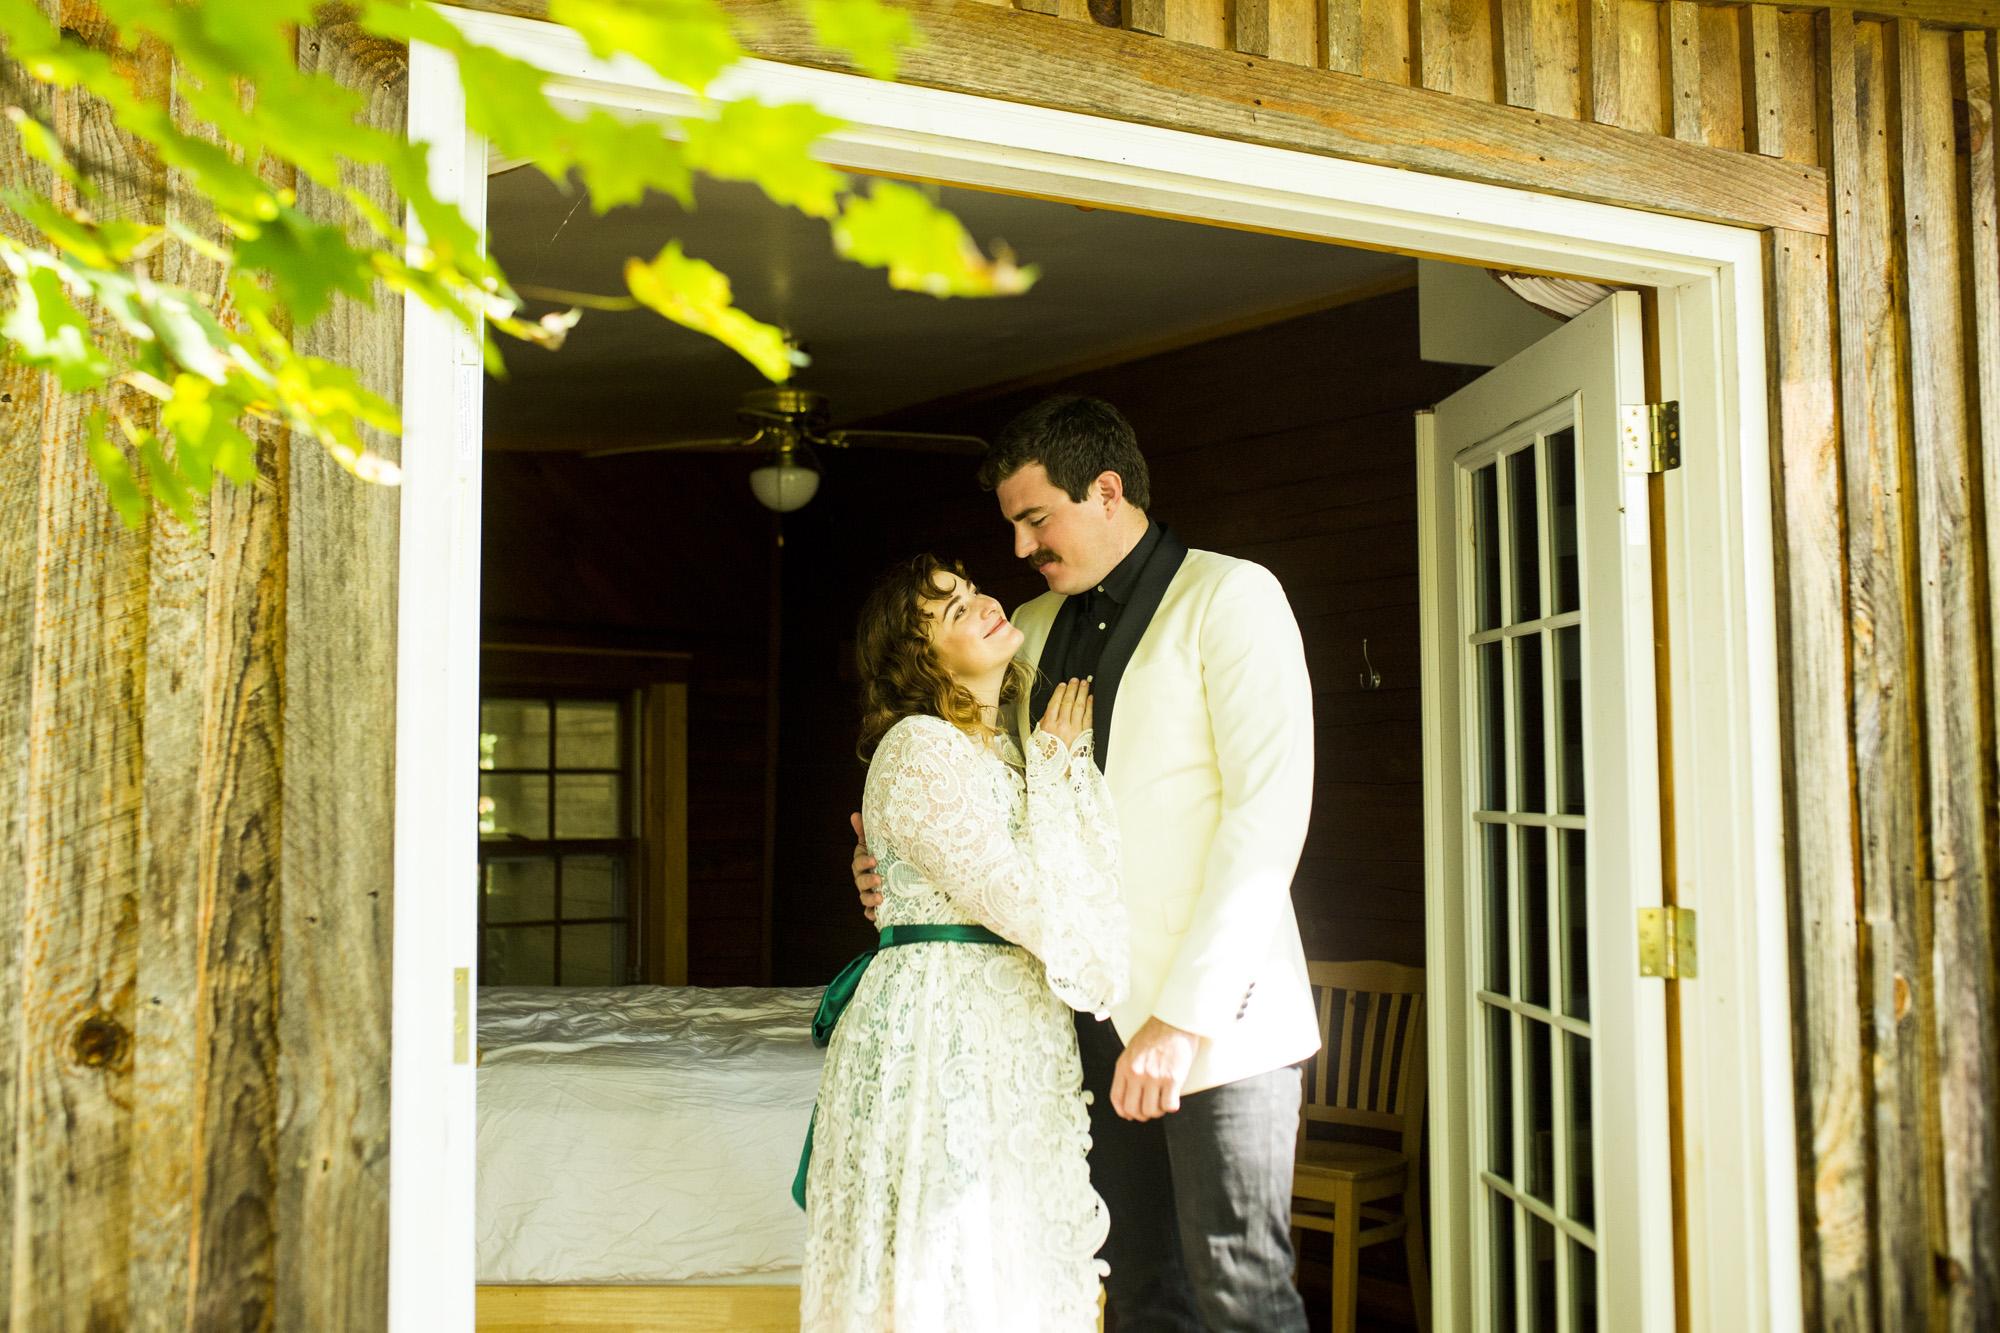 Seriously_Sabrina_Photography_Red_River_Gorge_Kentucky_Wedding_ShawnDana50.jpg